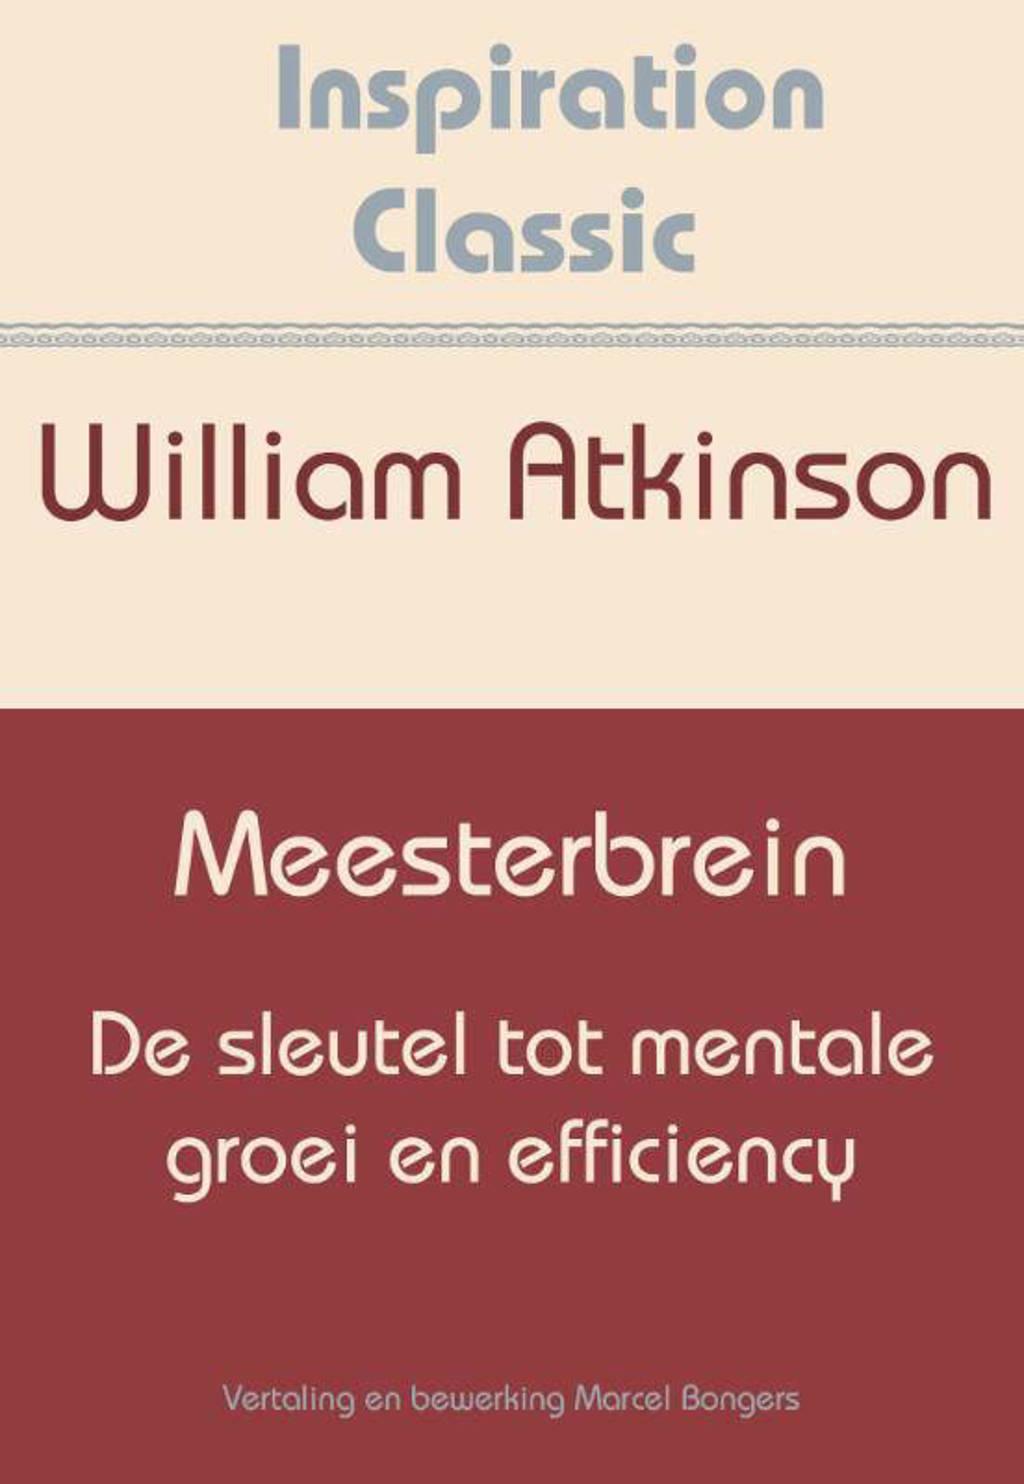 Inspiration Classic: Meesterbrein - William Atkinson